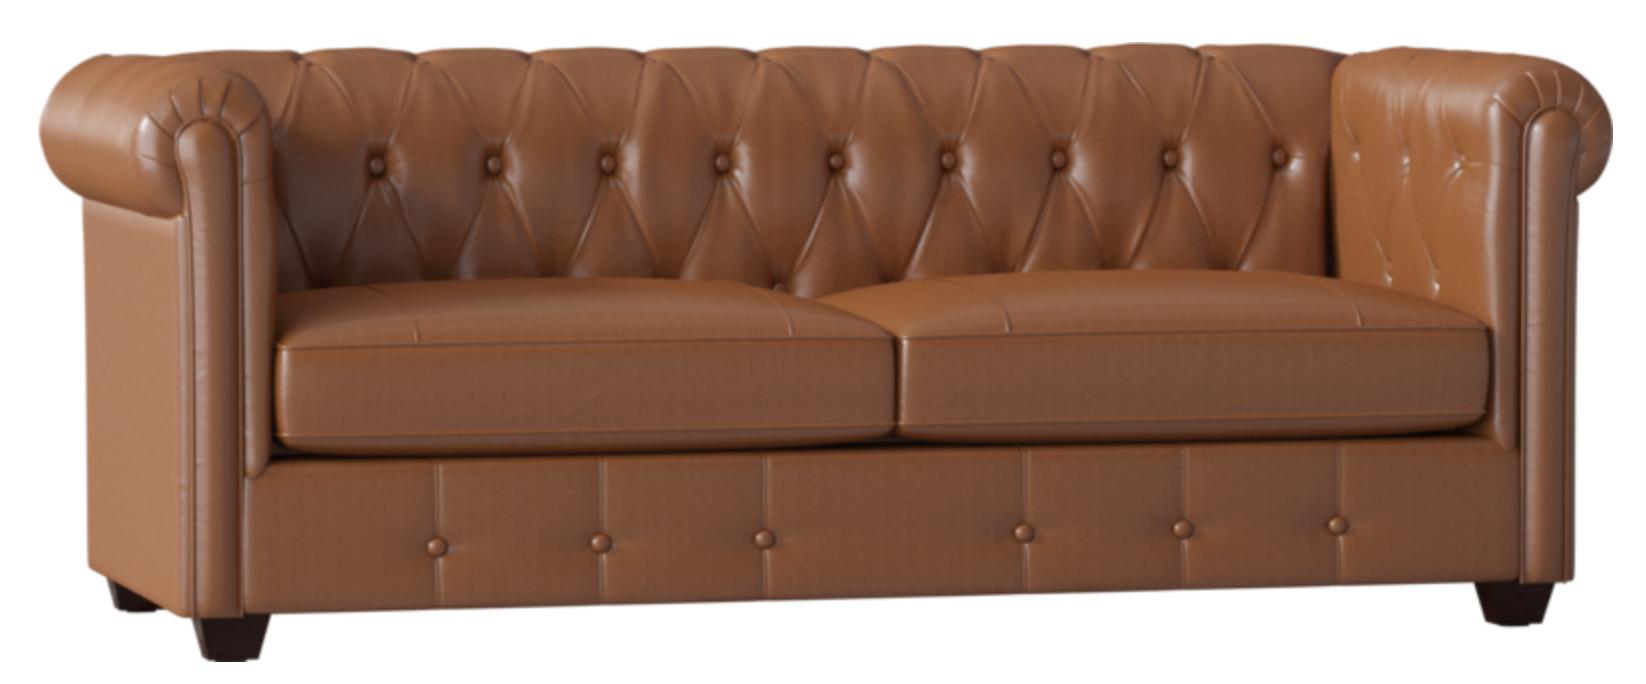 Birch Lane Hawthorn Leather Chesterfield Sofa